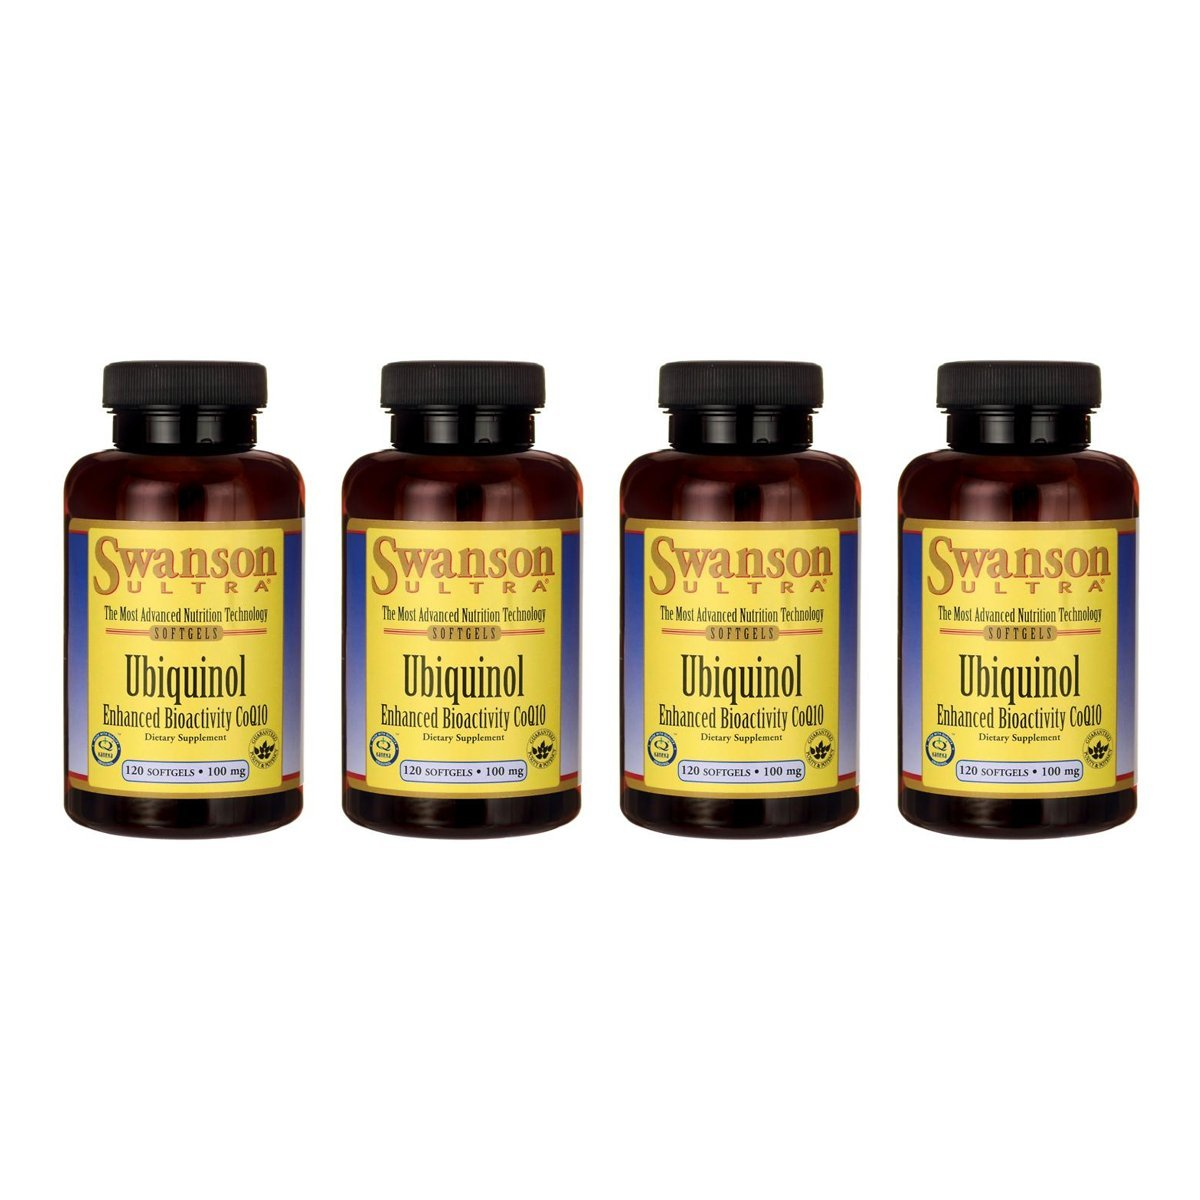 Swanson Ubiquinol 100 mg 120 Sgels 4 Pack